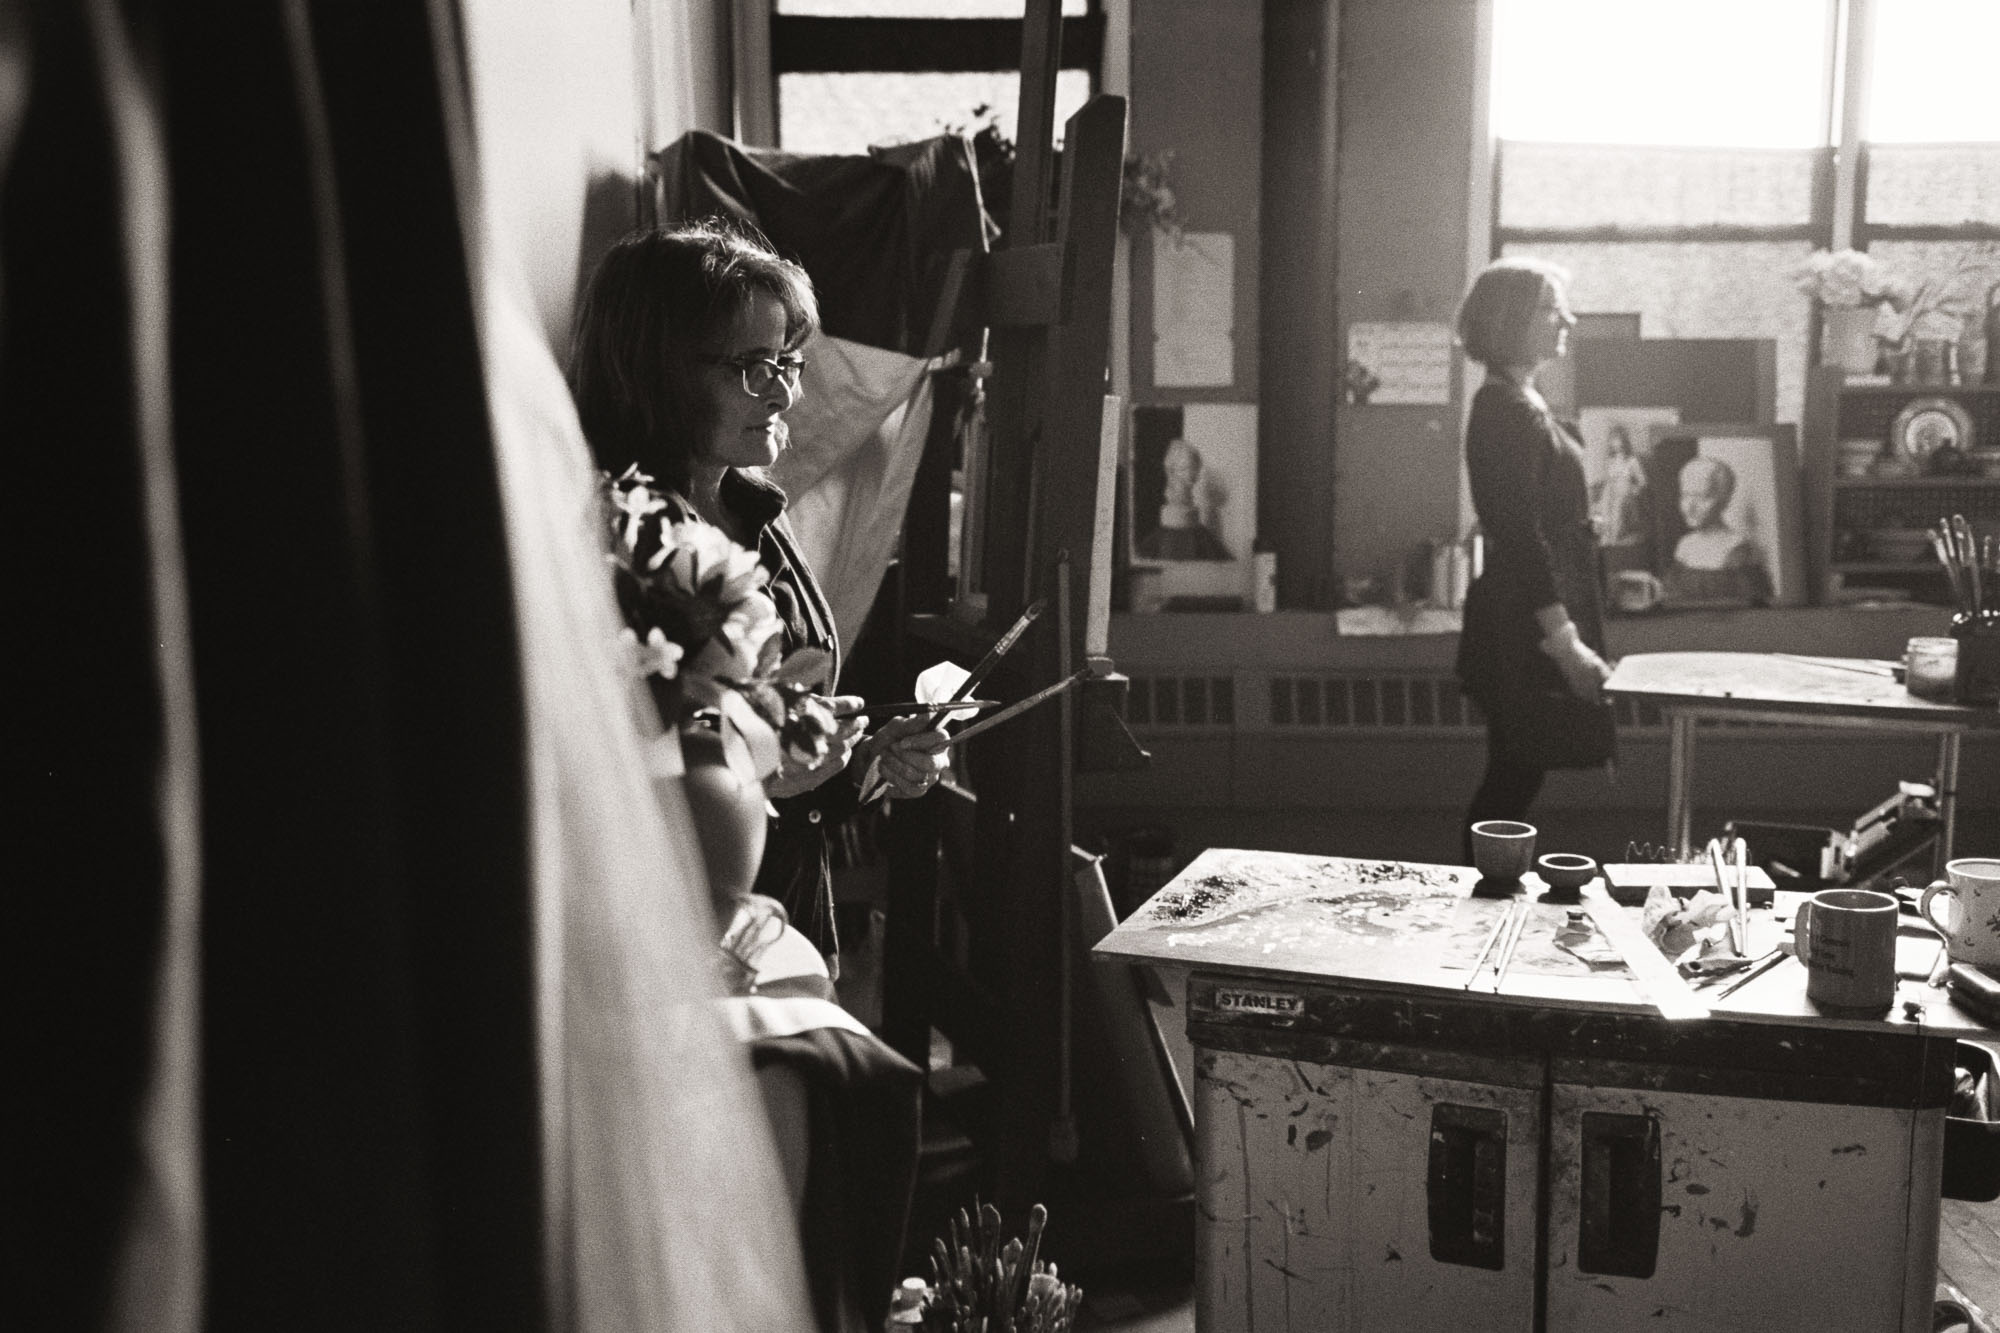 Ingbretson_atelier_by_Lomanno-21.jpg